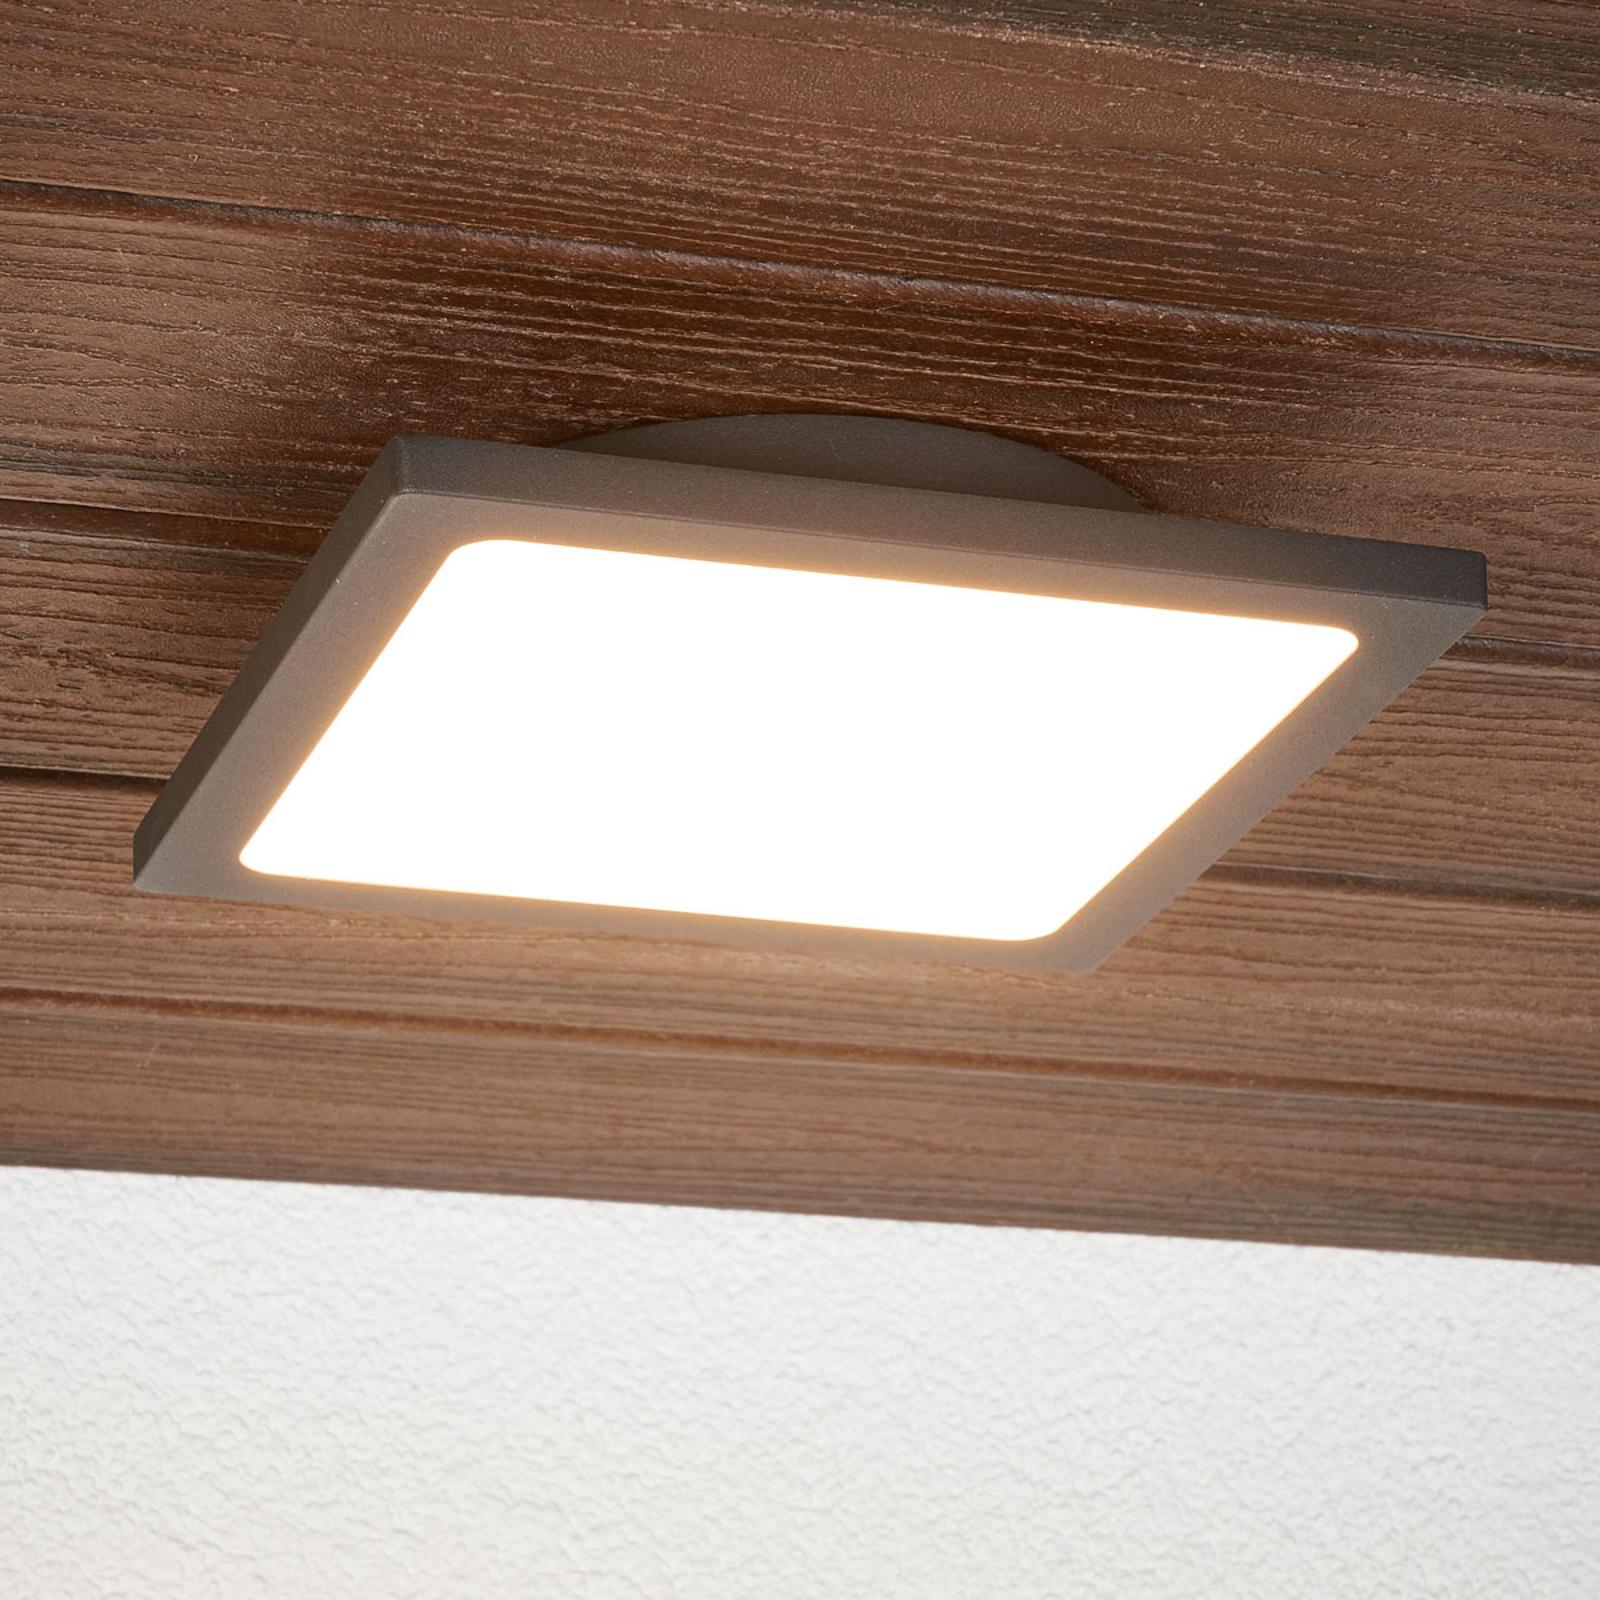 Foco de techo para exterior LED Mabella sensor